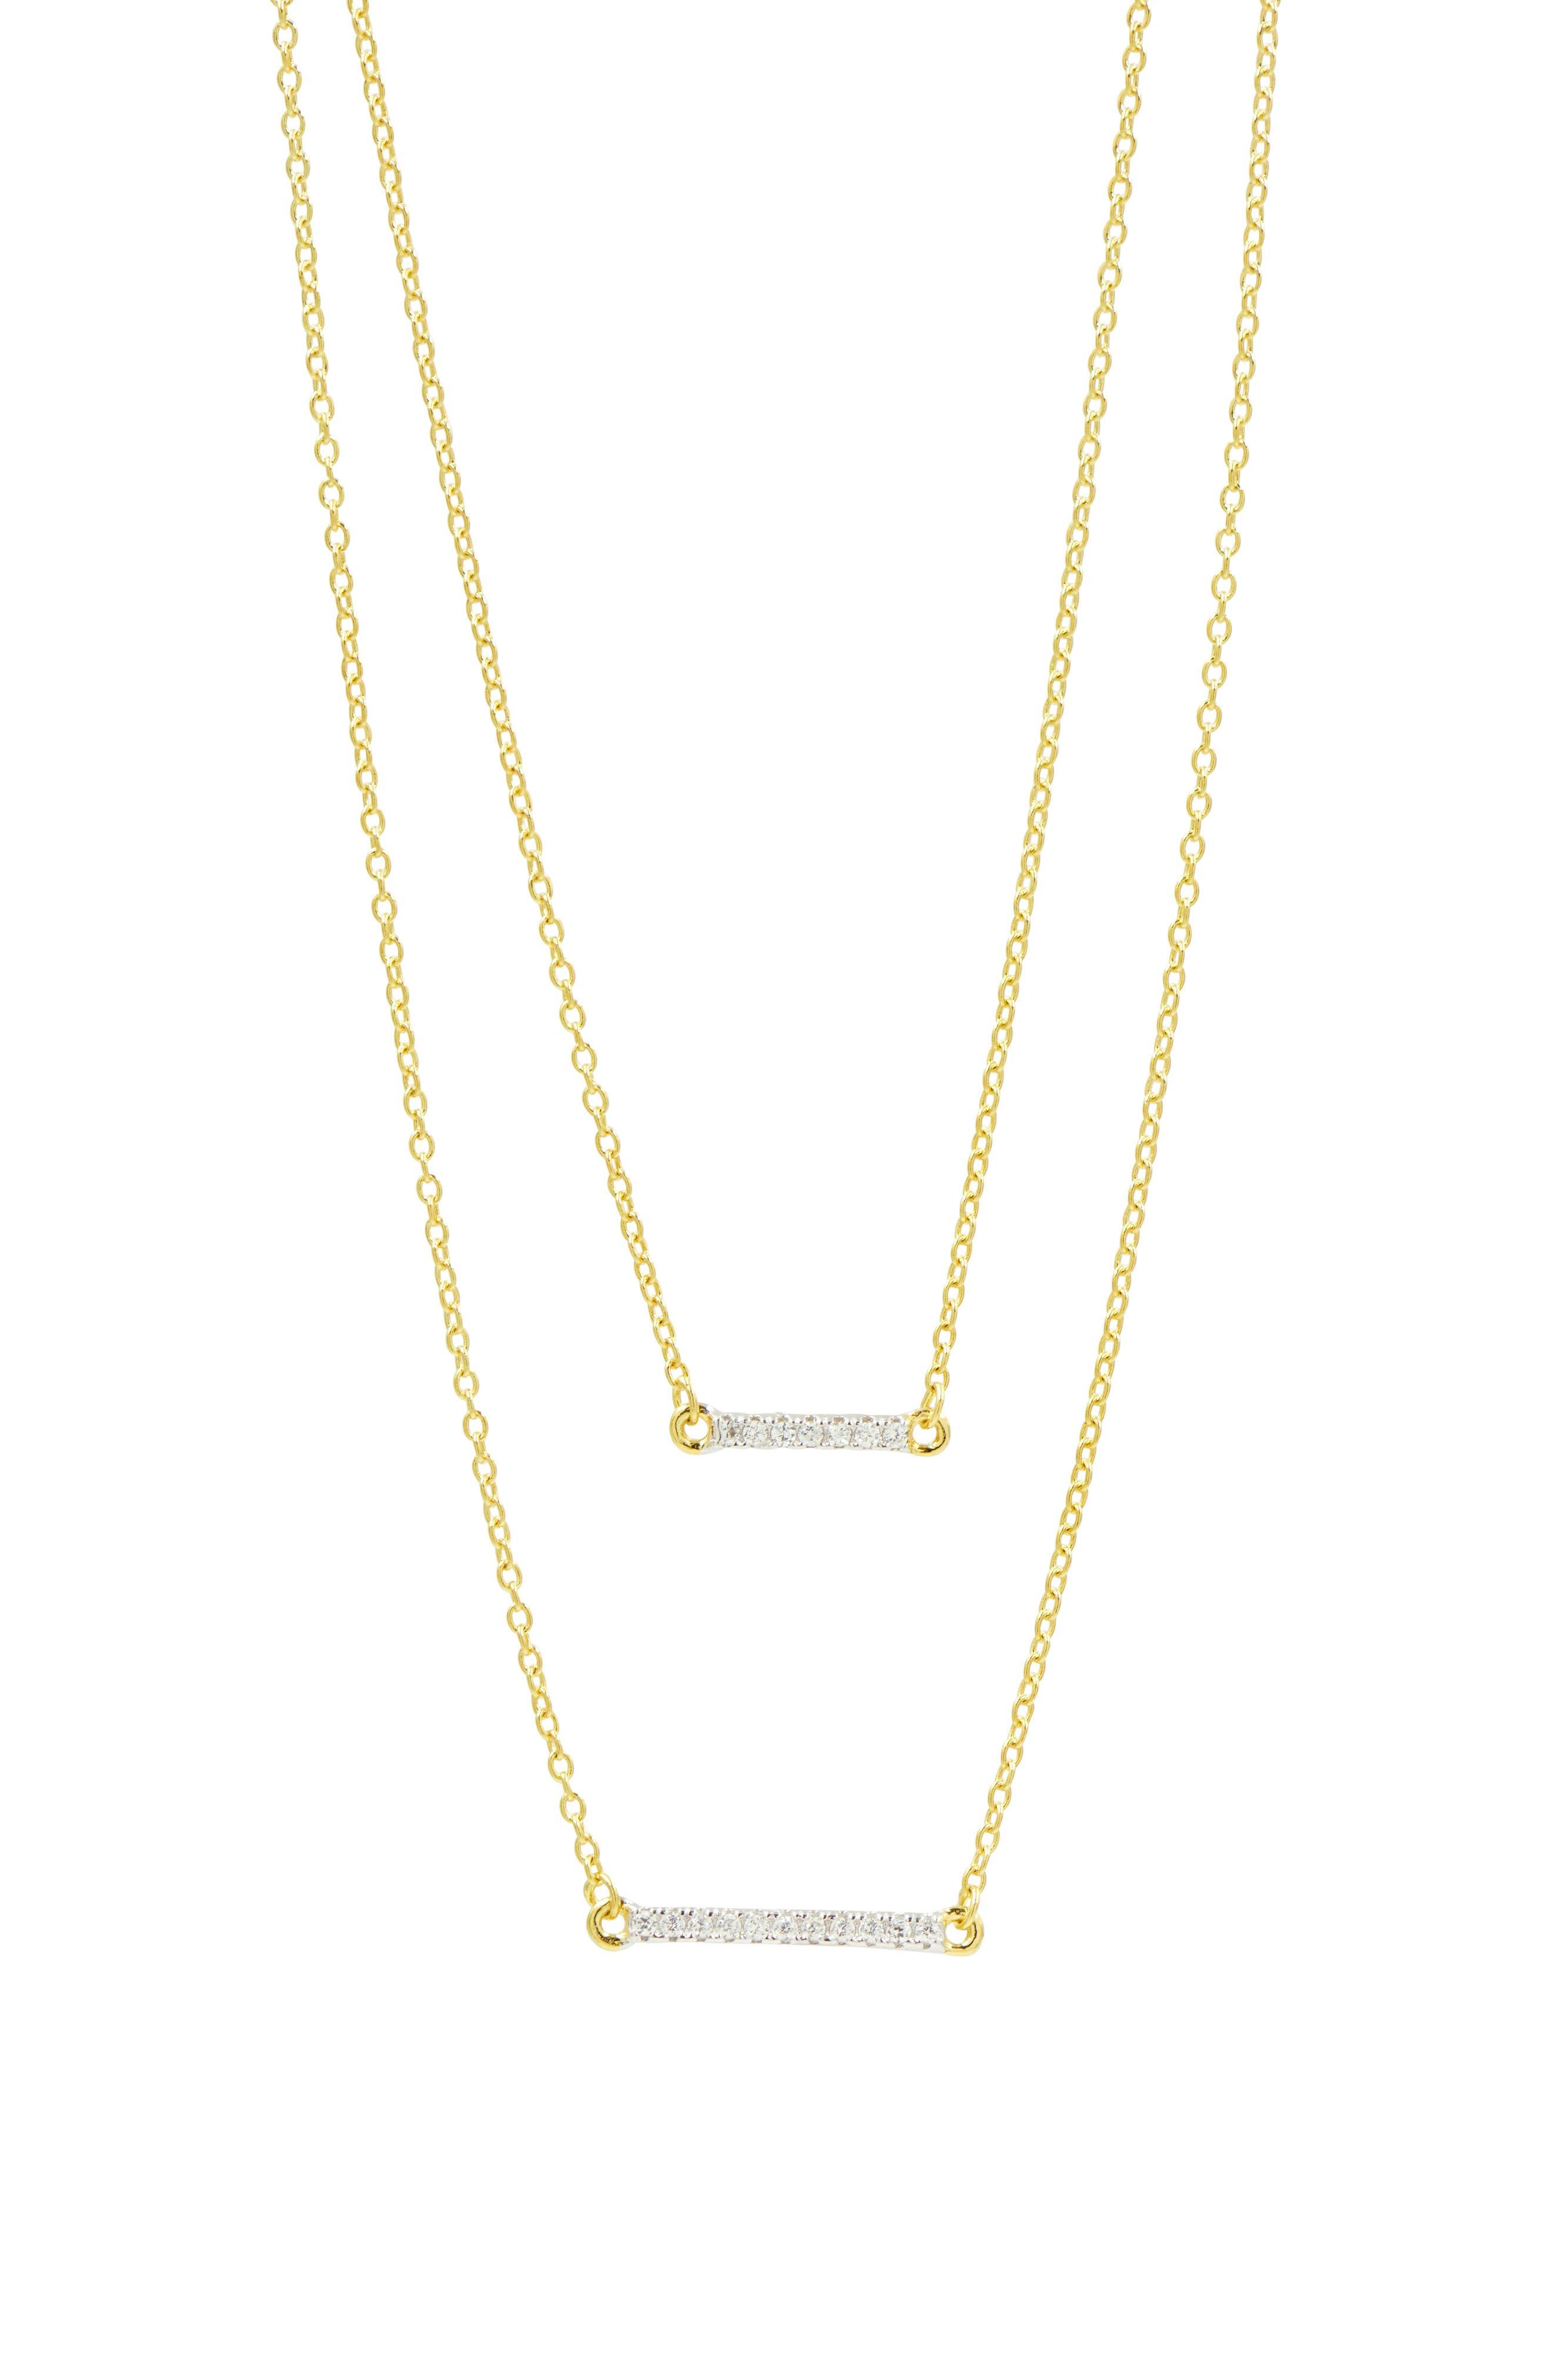 FREIDA ROTHMAN Radiance Double Pendant Necklace